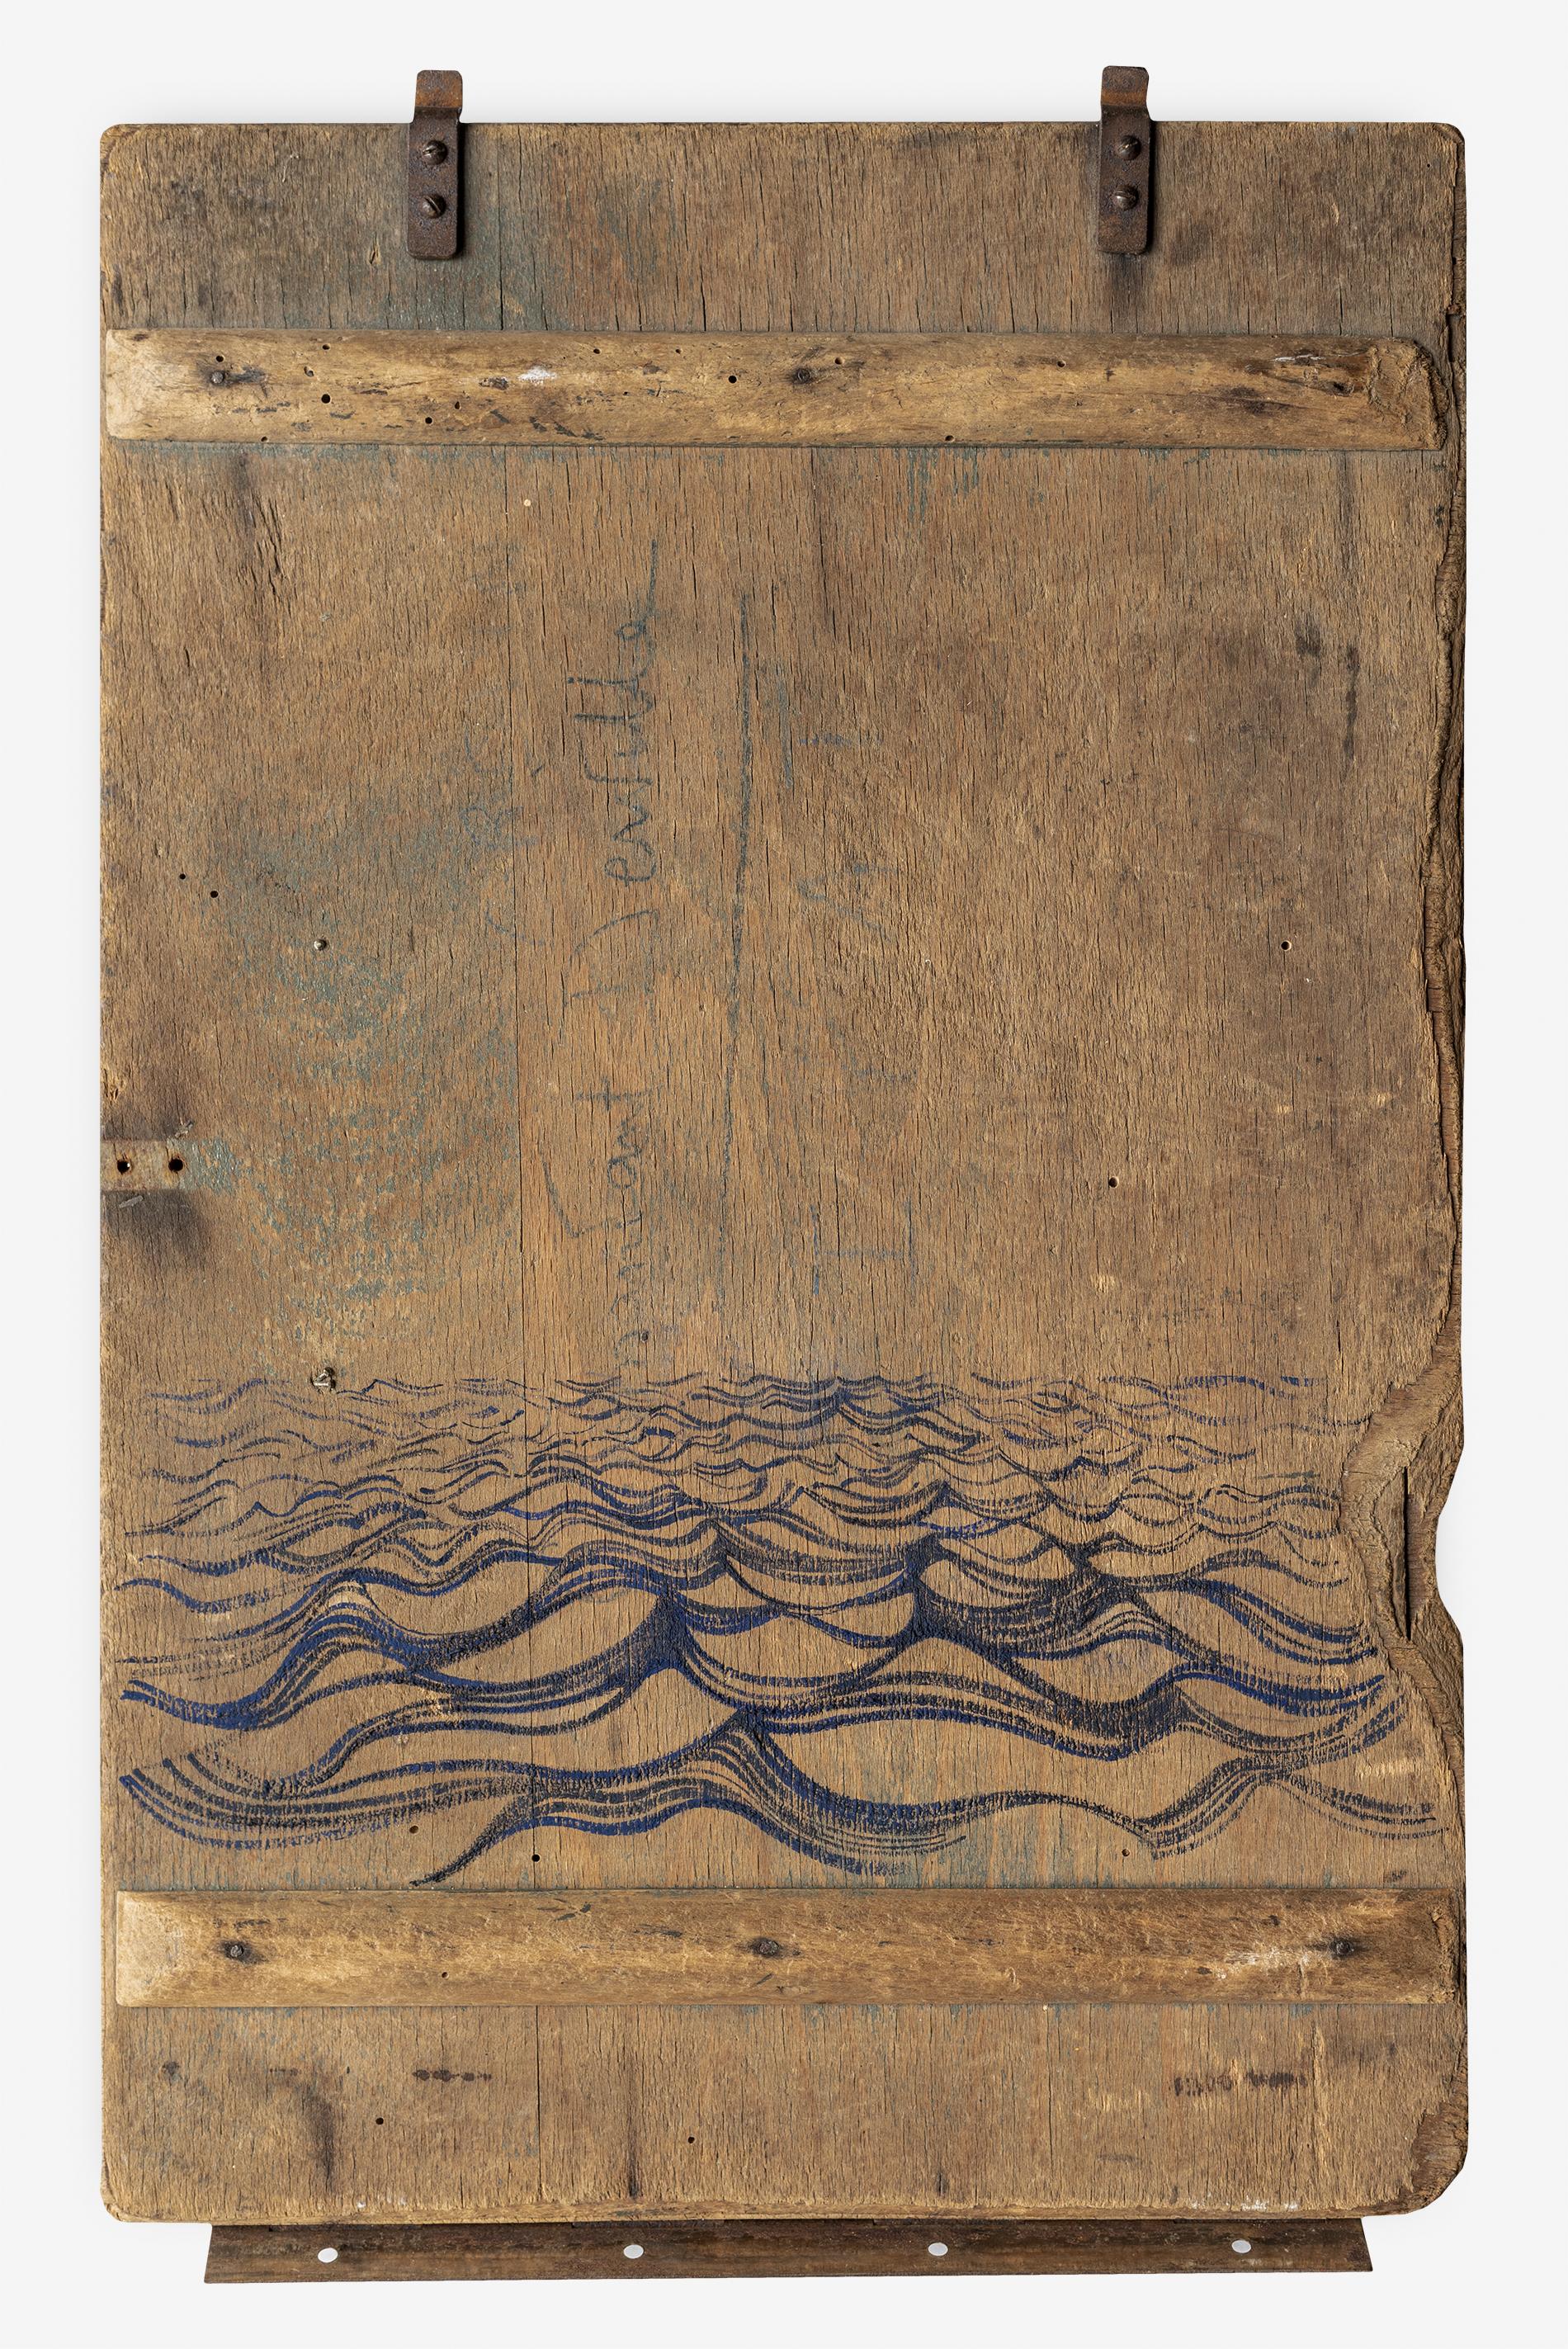 Stefantiek II  2018 27 x 42 cm · Gouache on box-lid (treated)  Reserve: info@davidcass.art